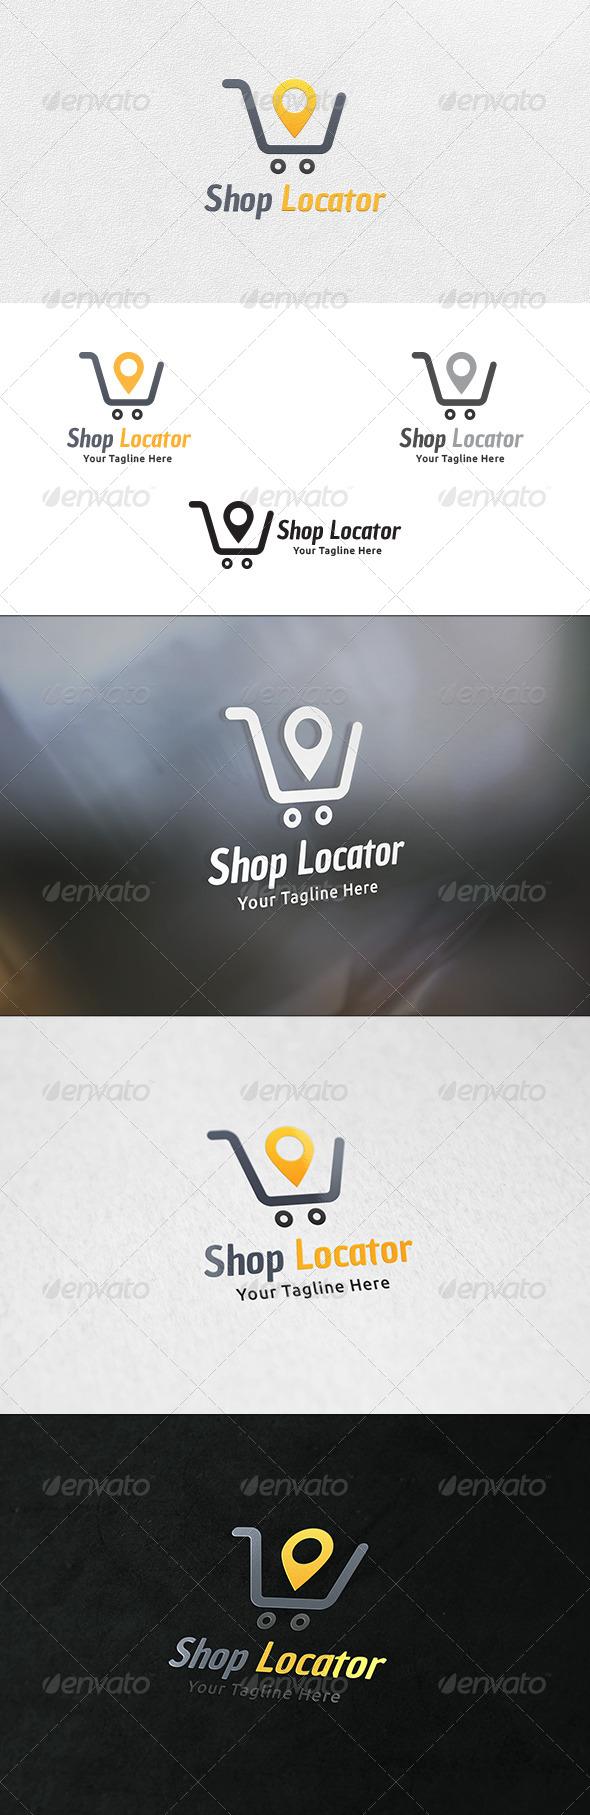 Shop Locator - Logo Template - Symbols Logo Templates